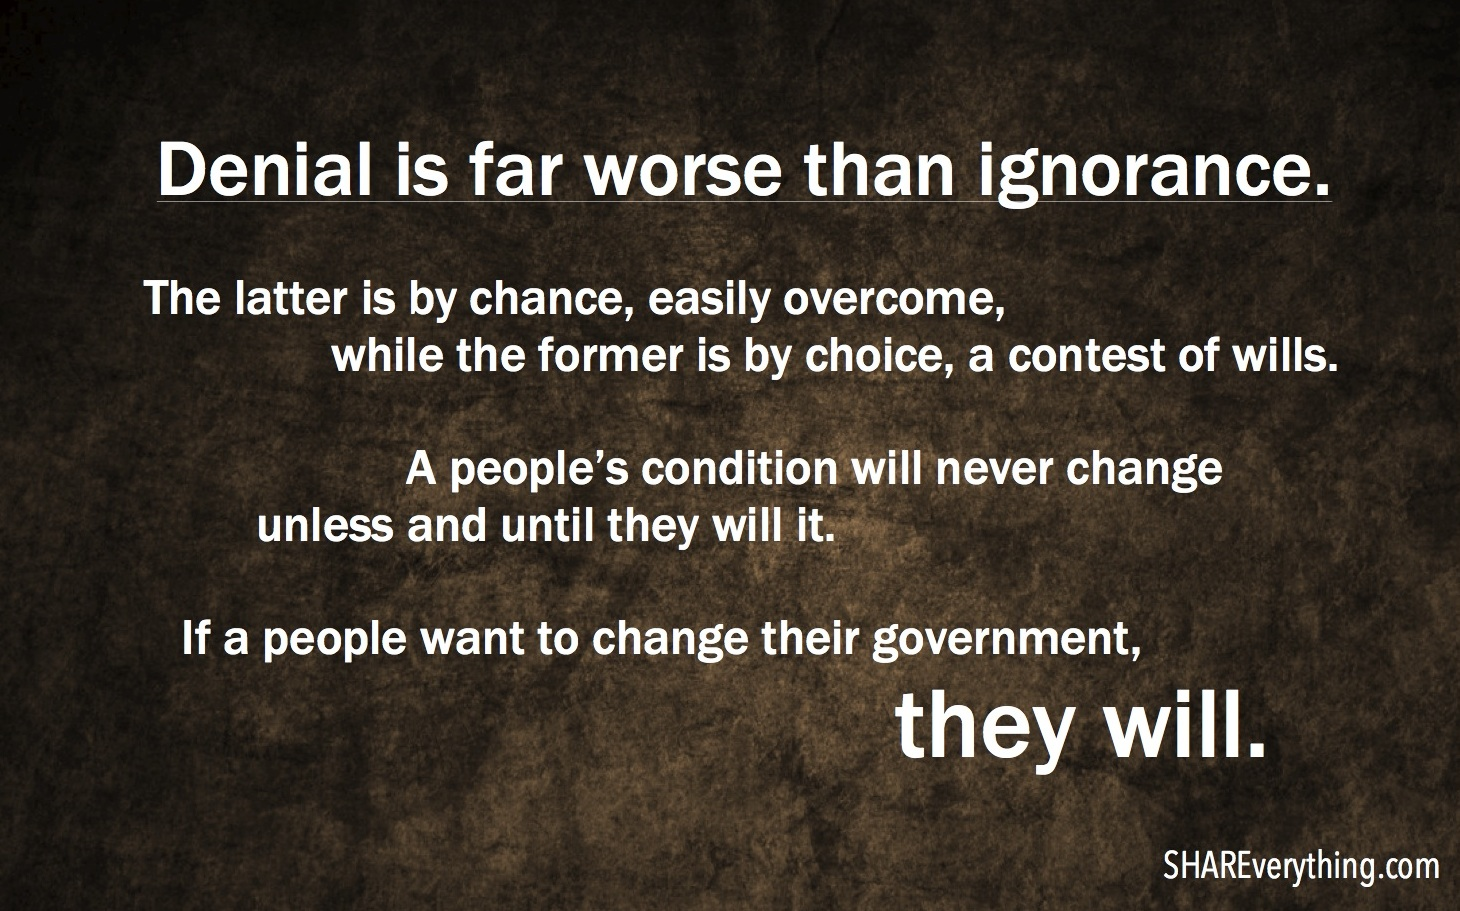 Denial V Ignorance SHAREverything